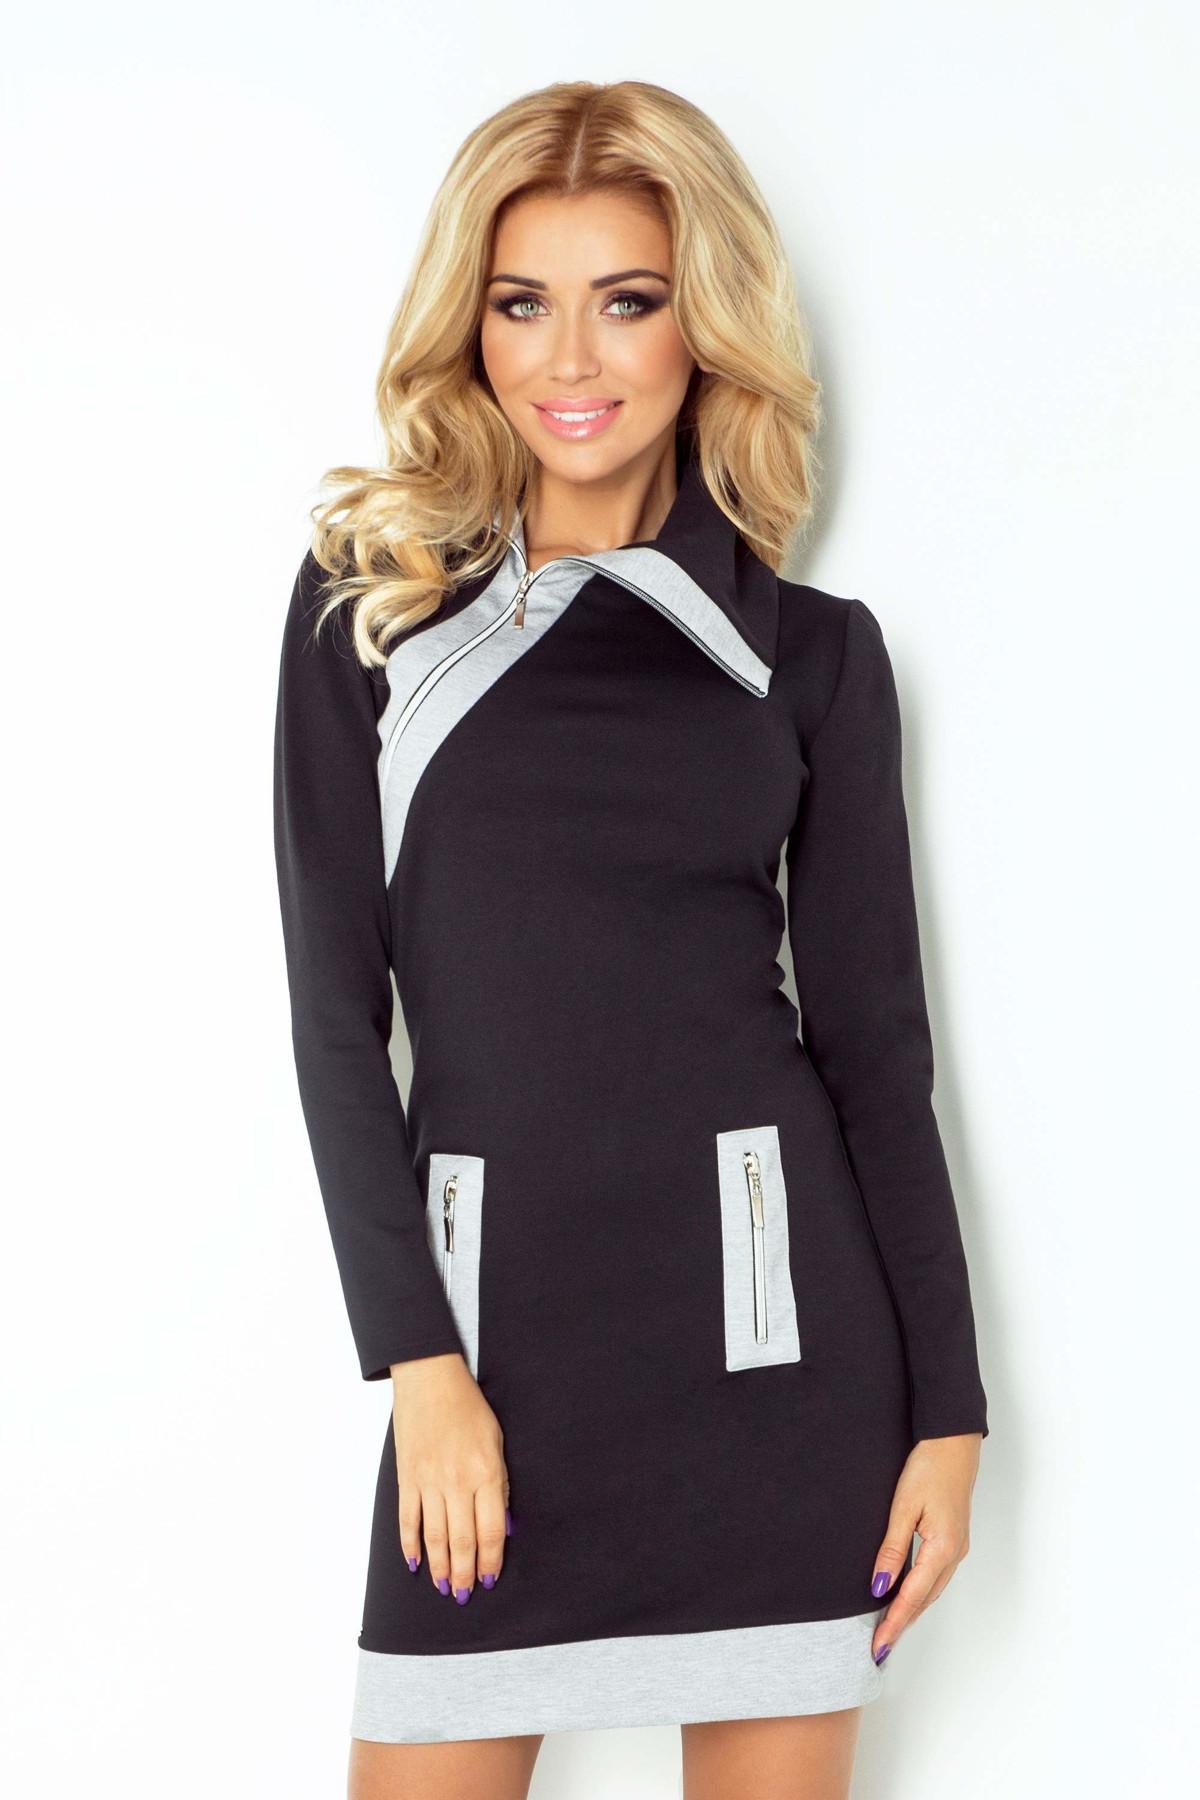 Dámske šaty značkové ZIPPY moderné s tromi zipsami čierne - Čierna - Numoco černá-šedá S